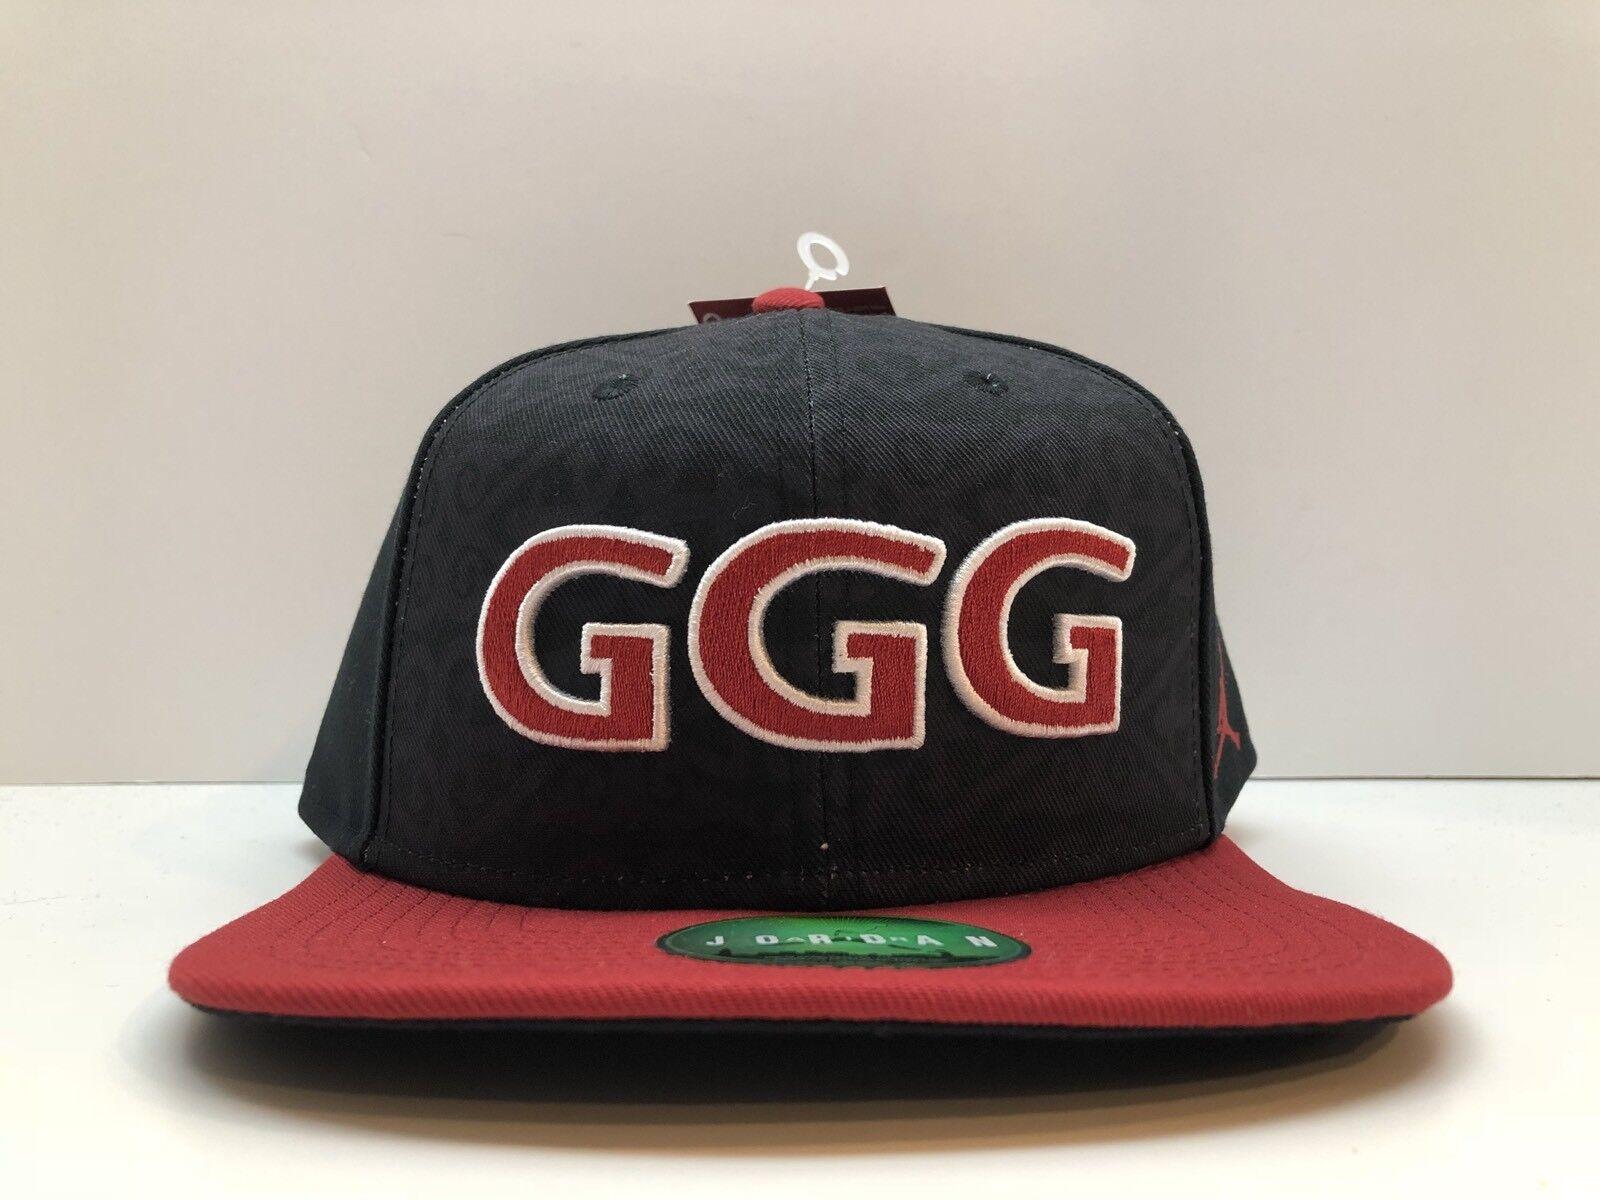 Nike X Jordan GGG Triple G Gennady Golovkin Snapback Hat Limited ... 23d61d92840a